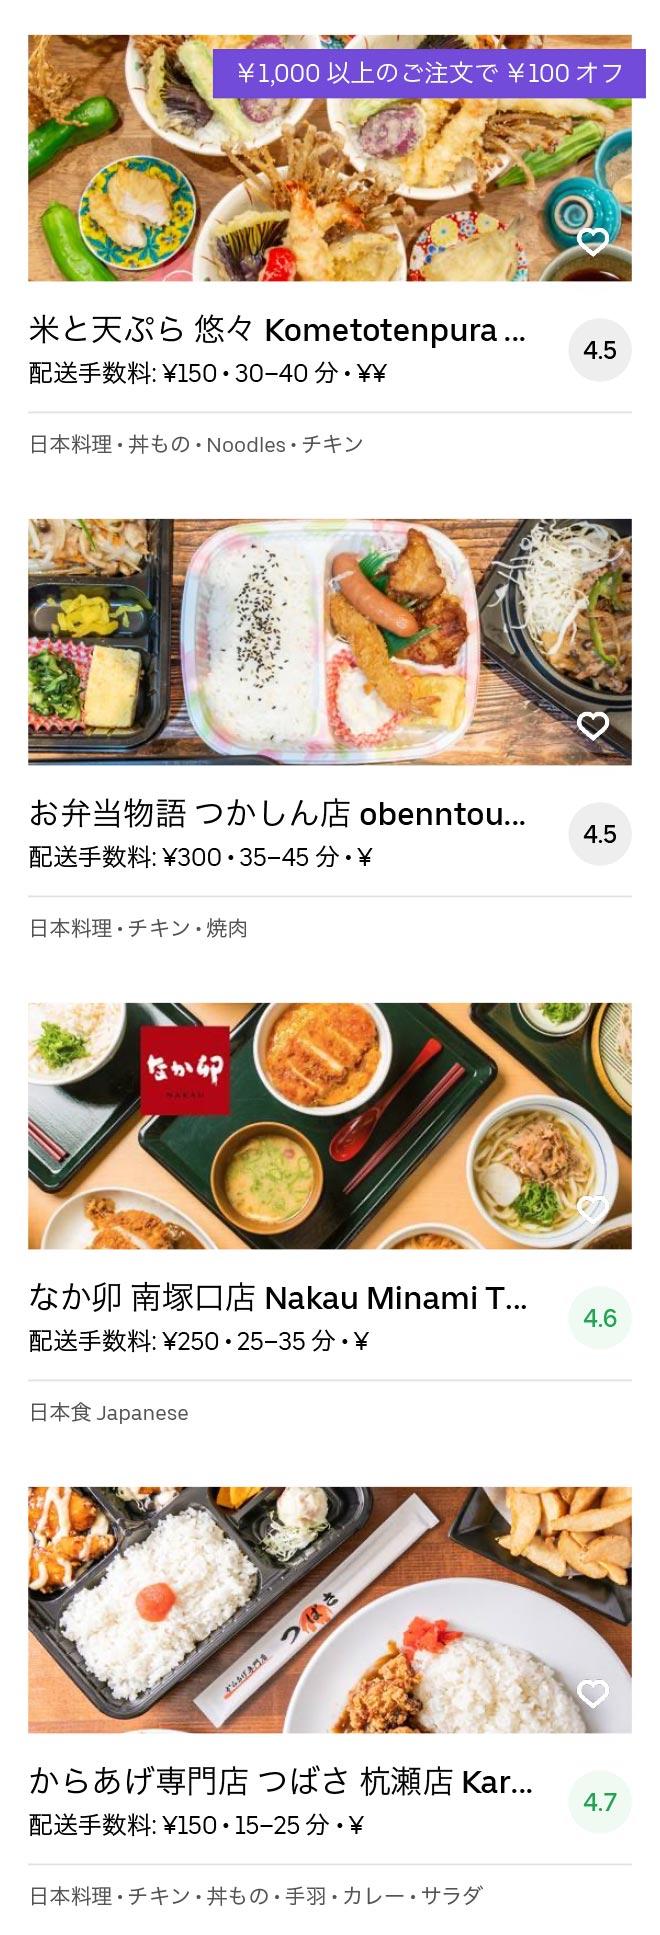 Amagasaki menu 2005 11